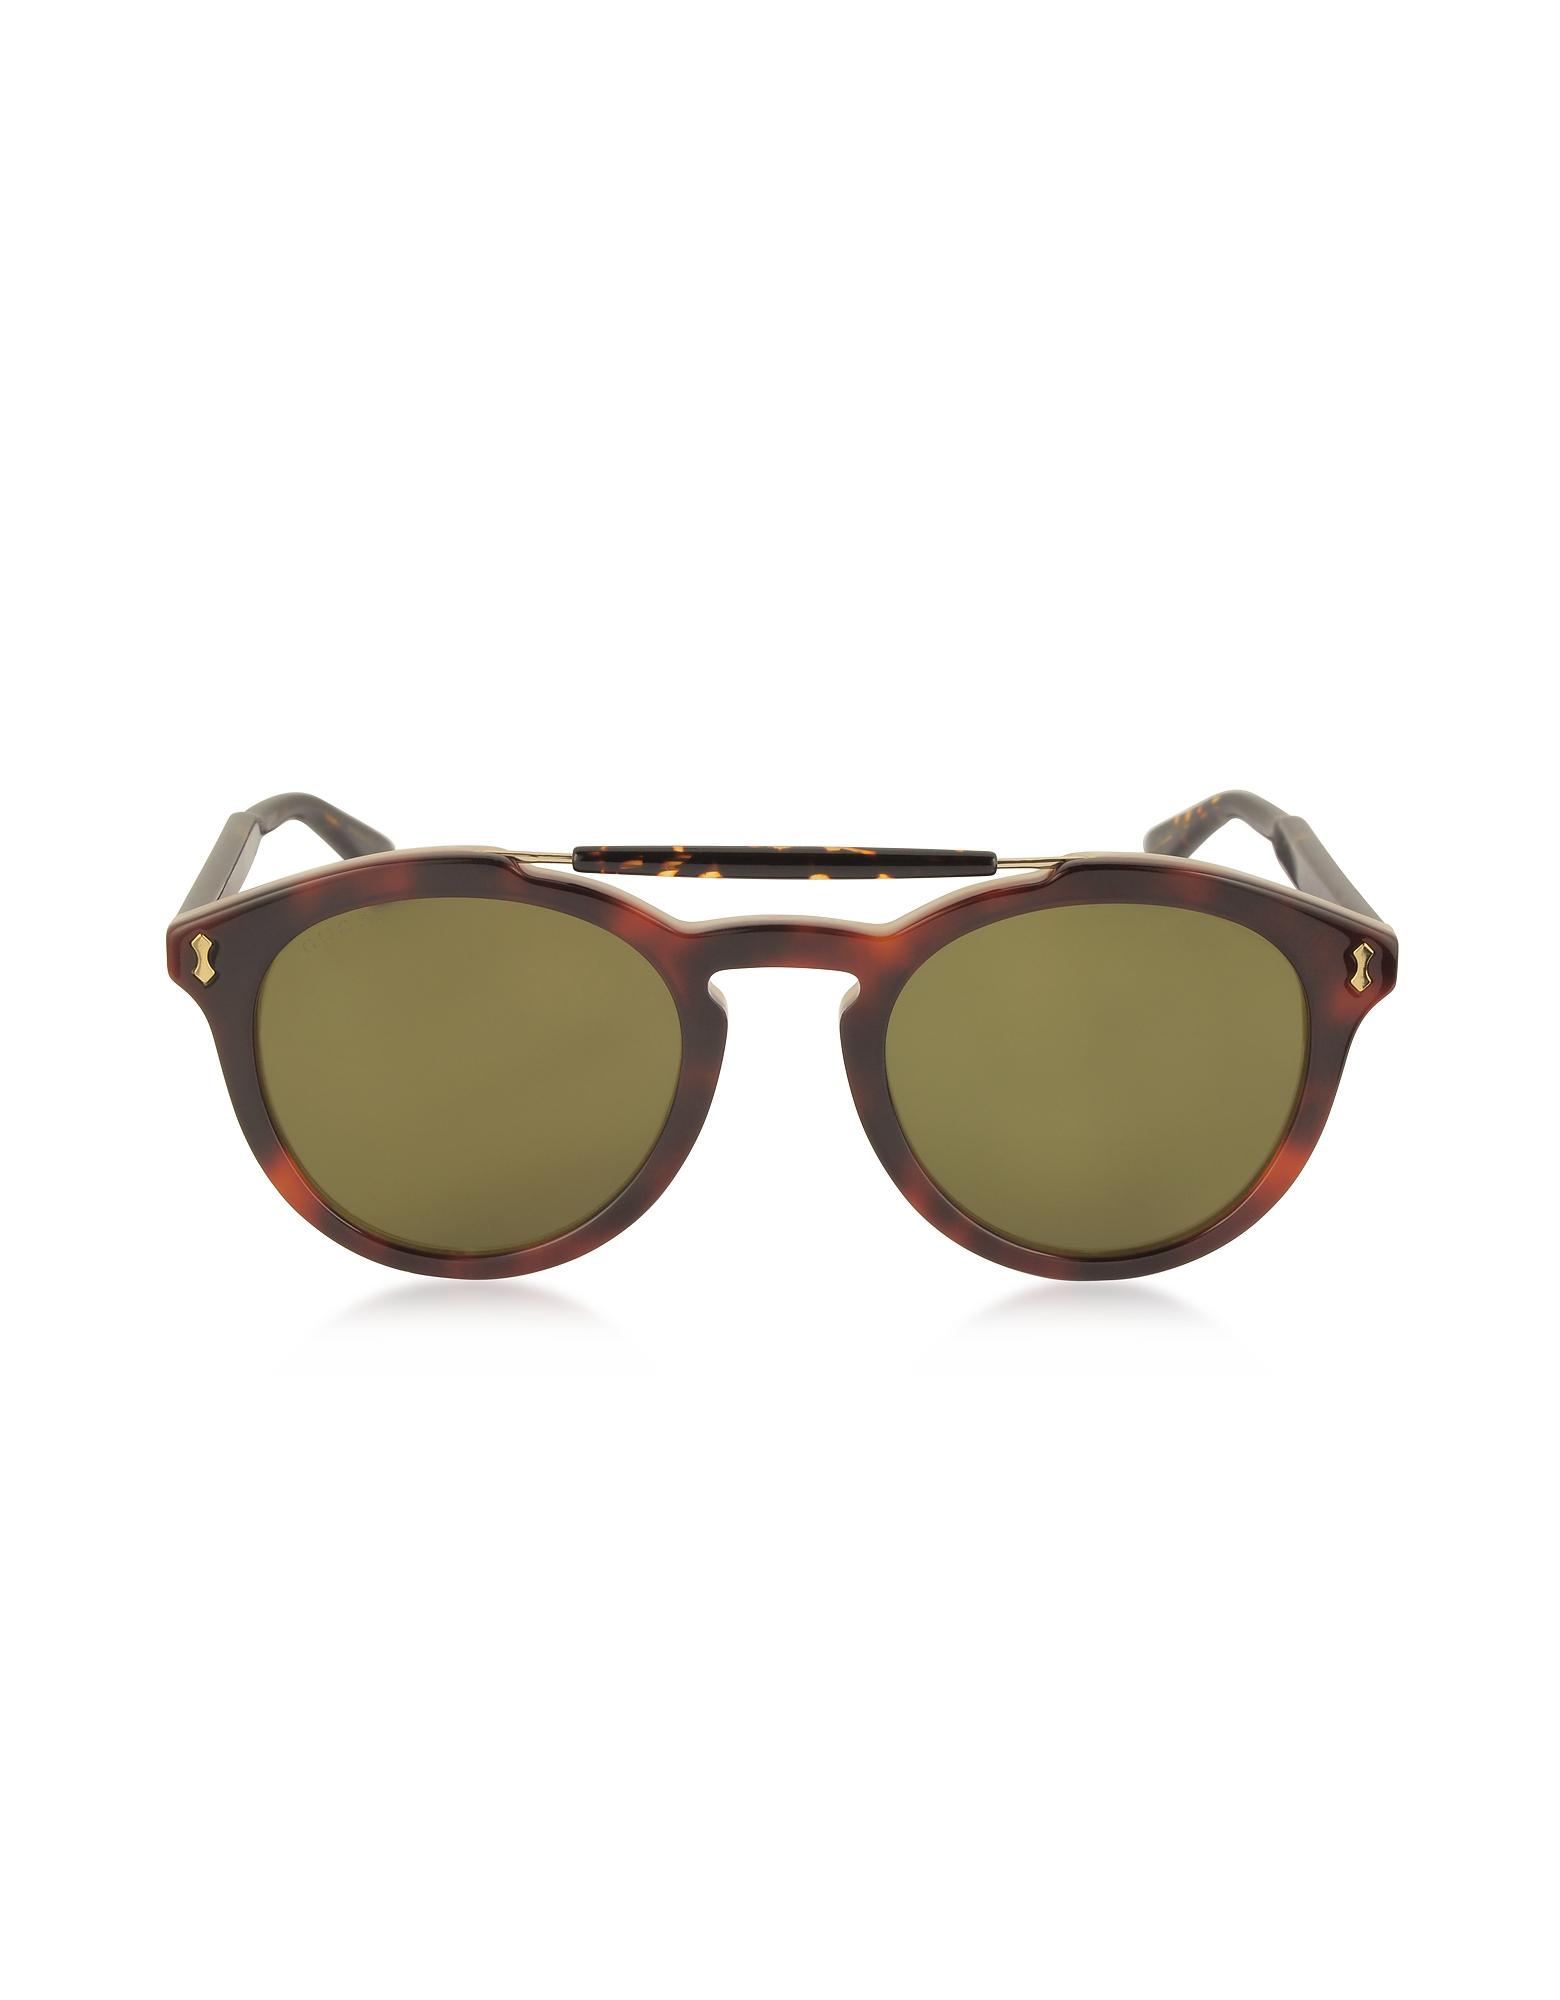 Gucci Designer Sunglasses, GG0124S Acetate Round Aviator Men's Sunglasses